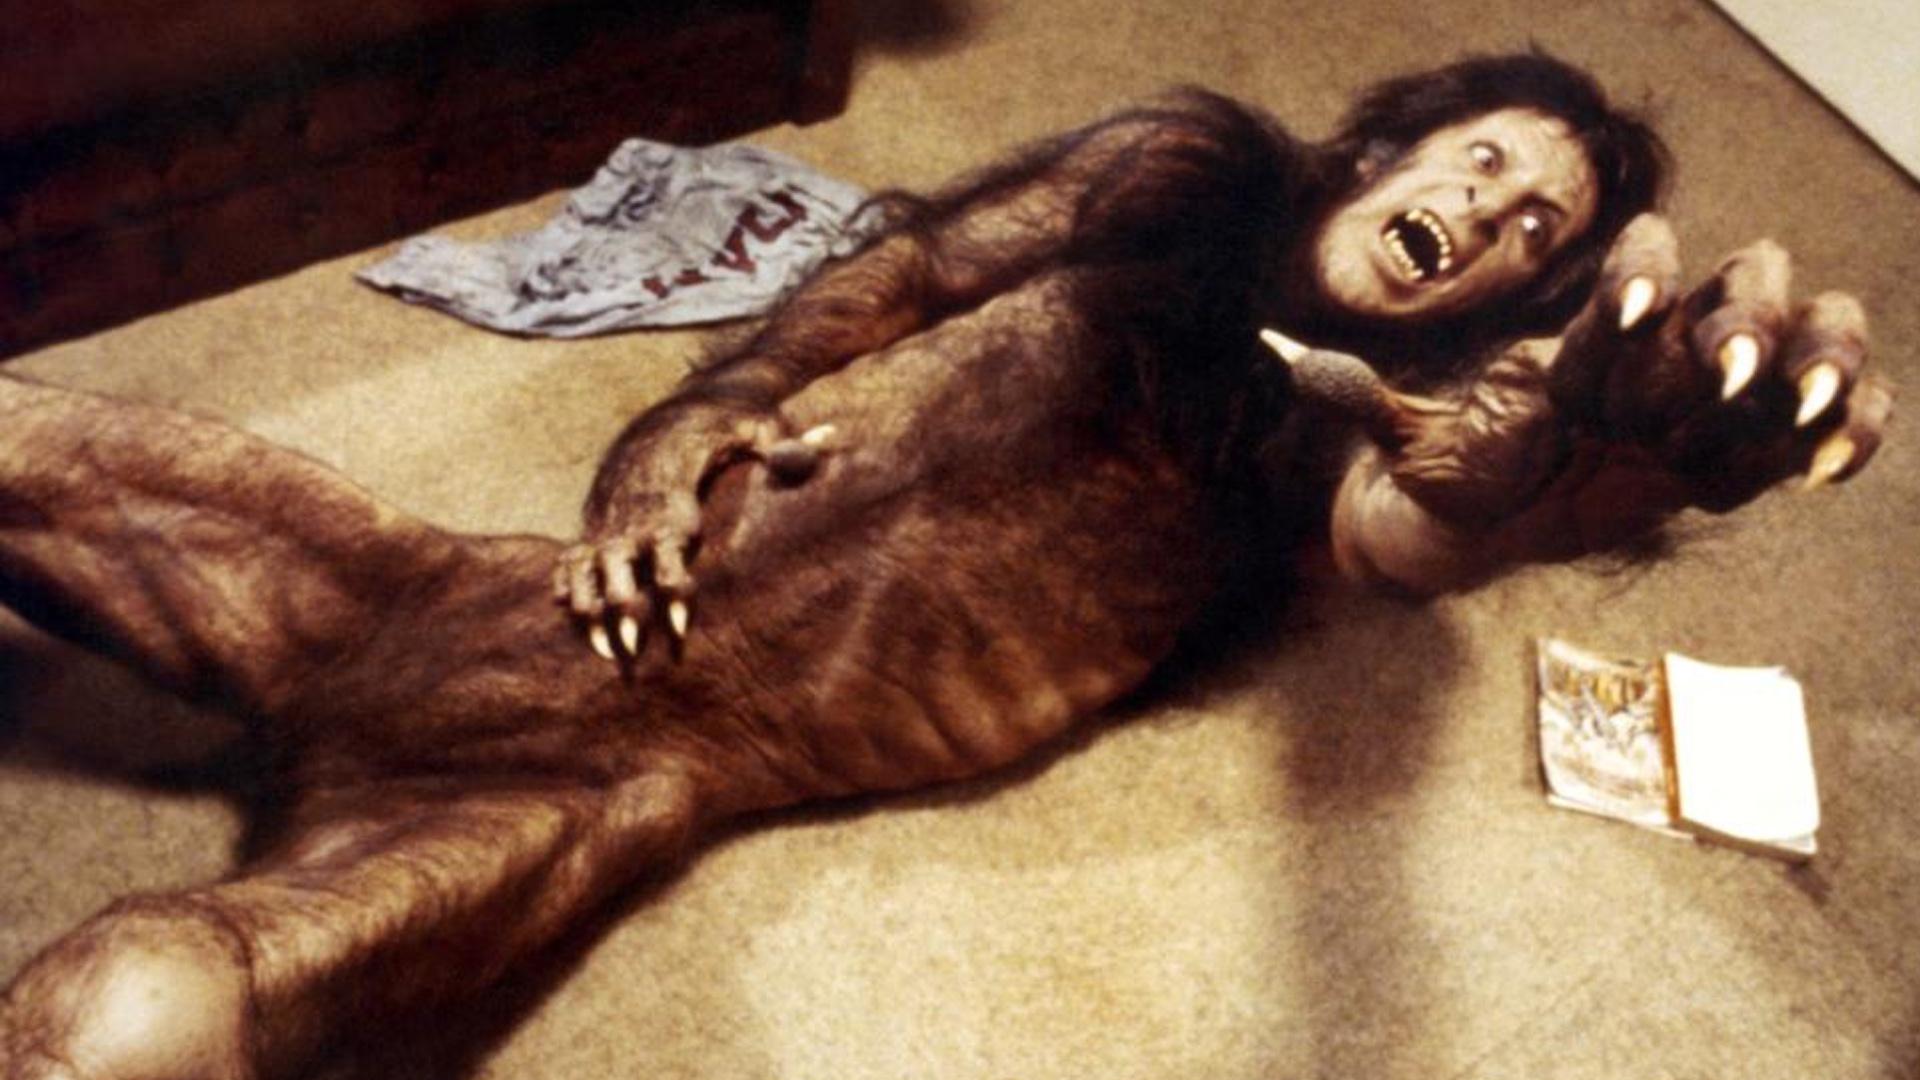 John Landis Wrote An Amazing Script For An American Werewolf In